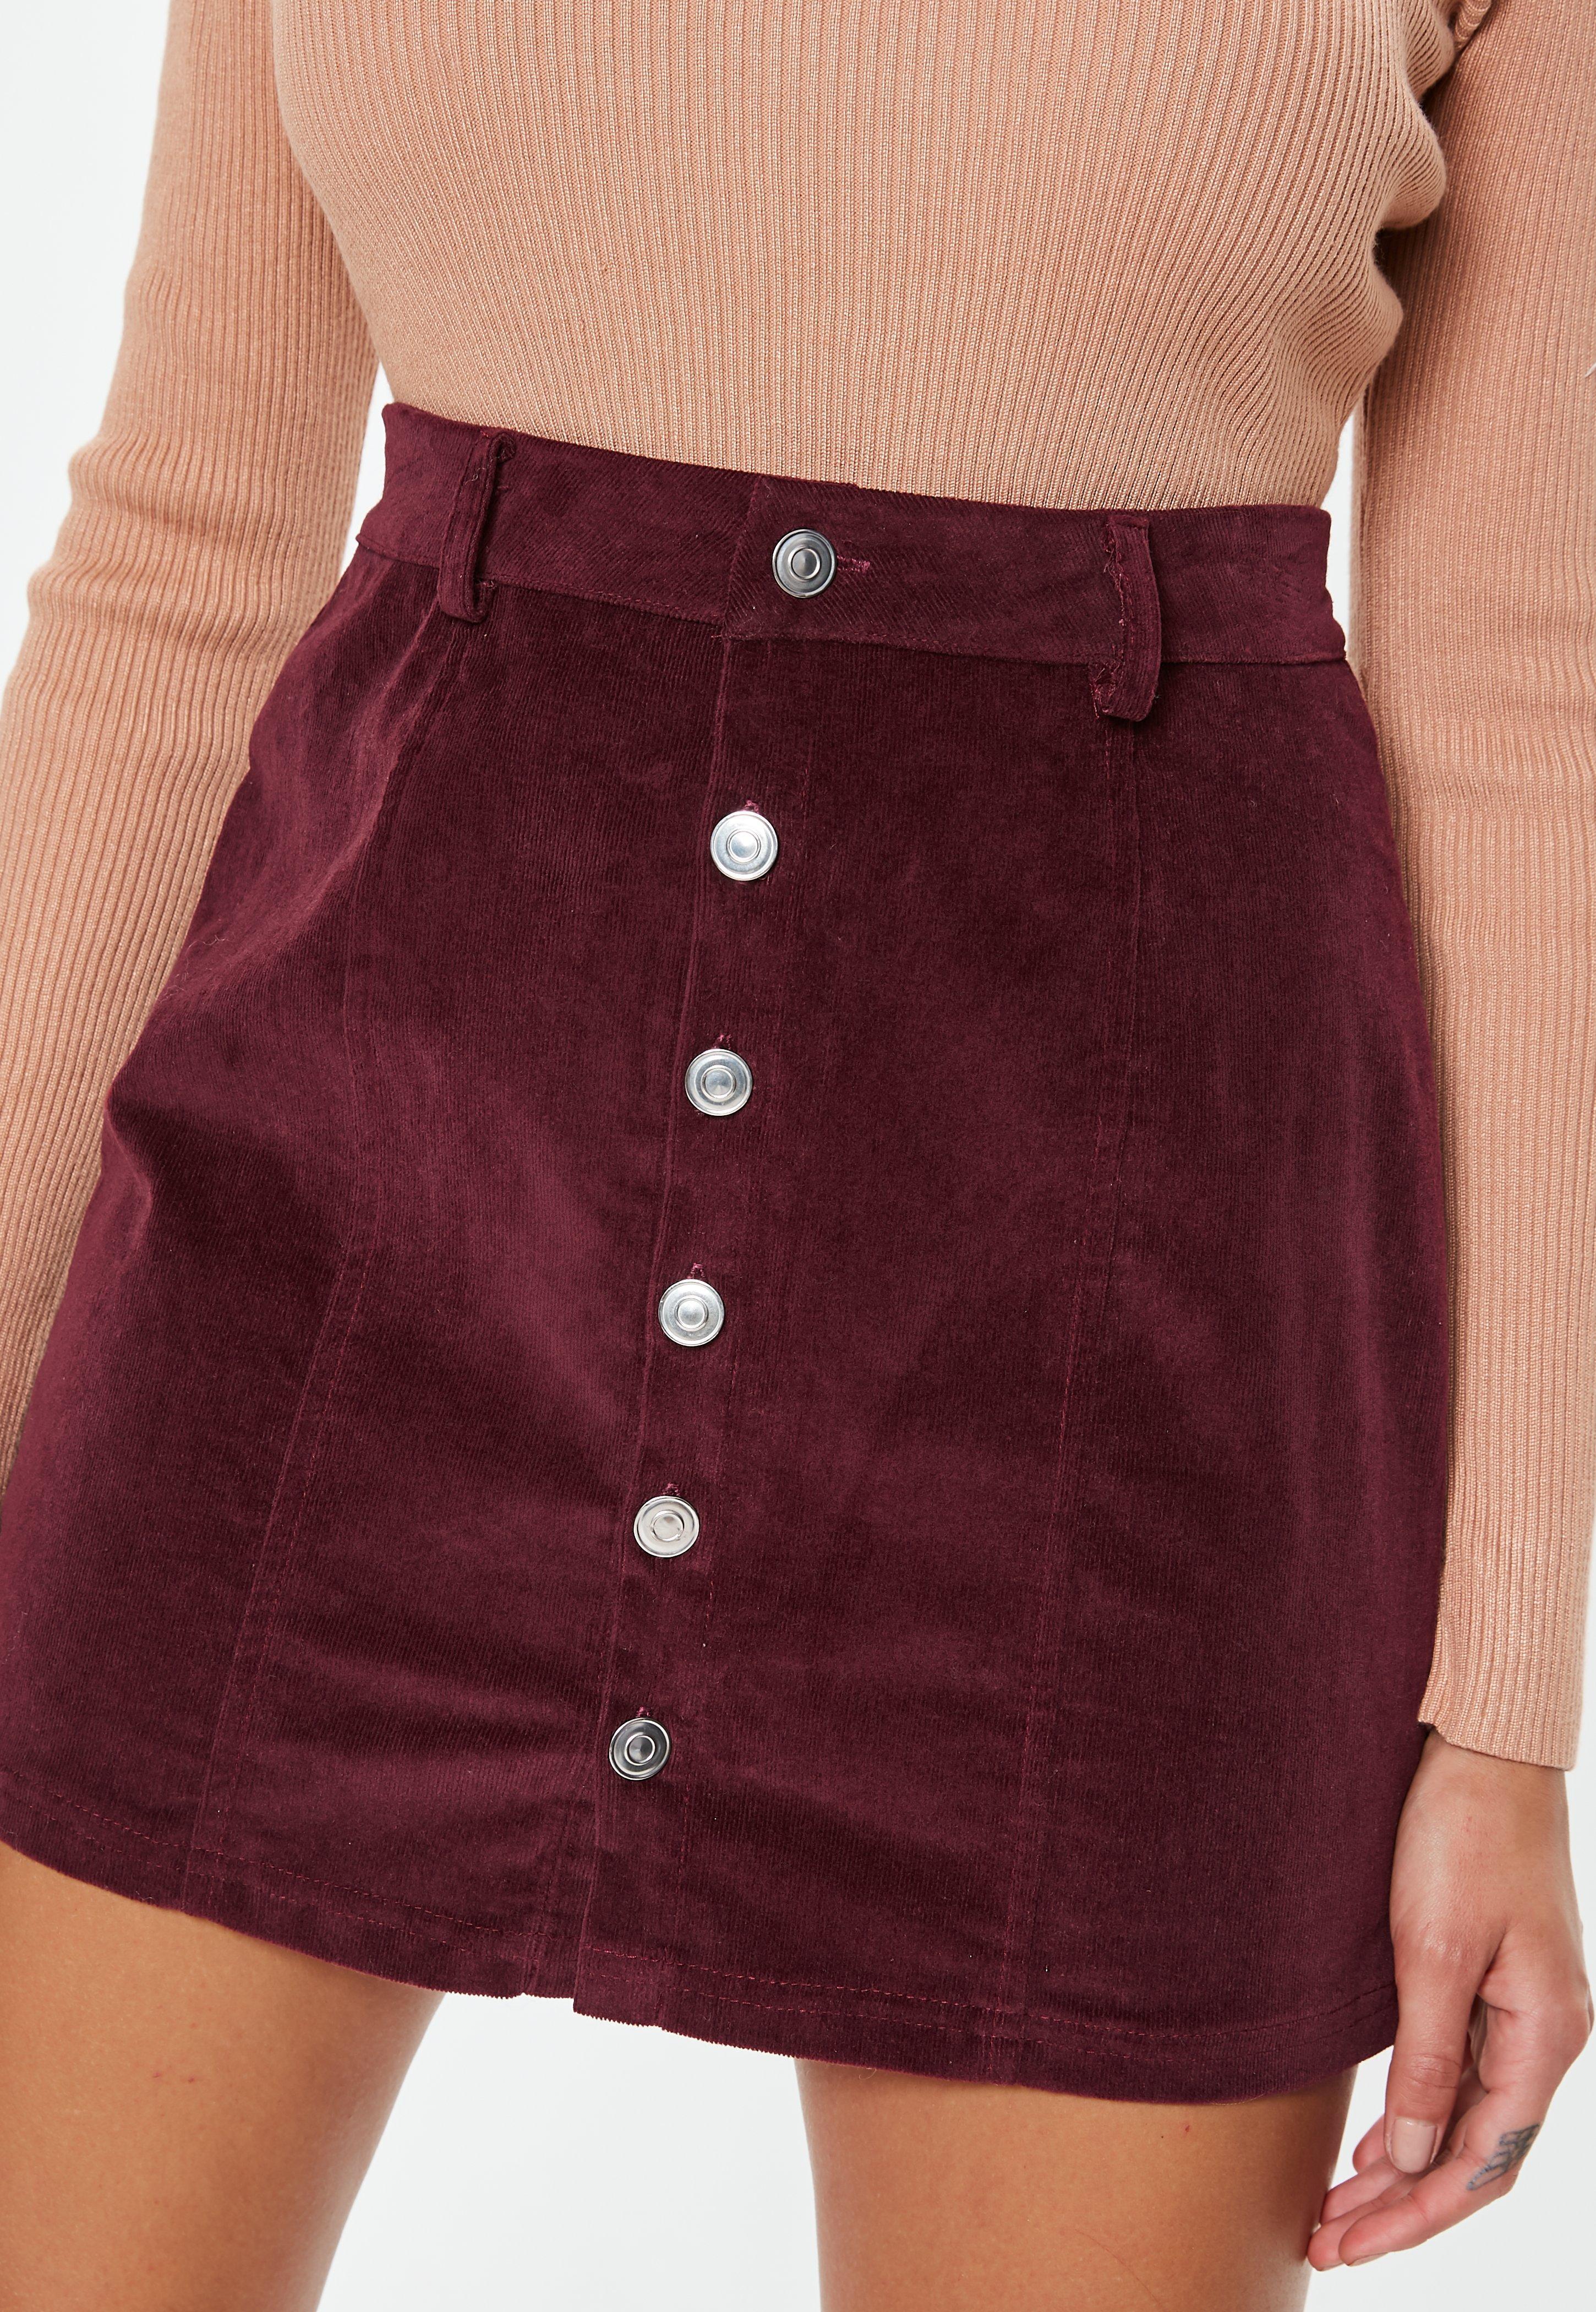 247fc9d5bd Missguided - Purple Plum Cord Button Mini Skirt - Lyst. View fullscreen